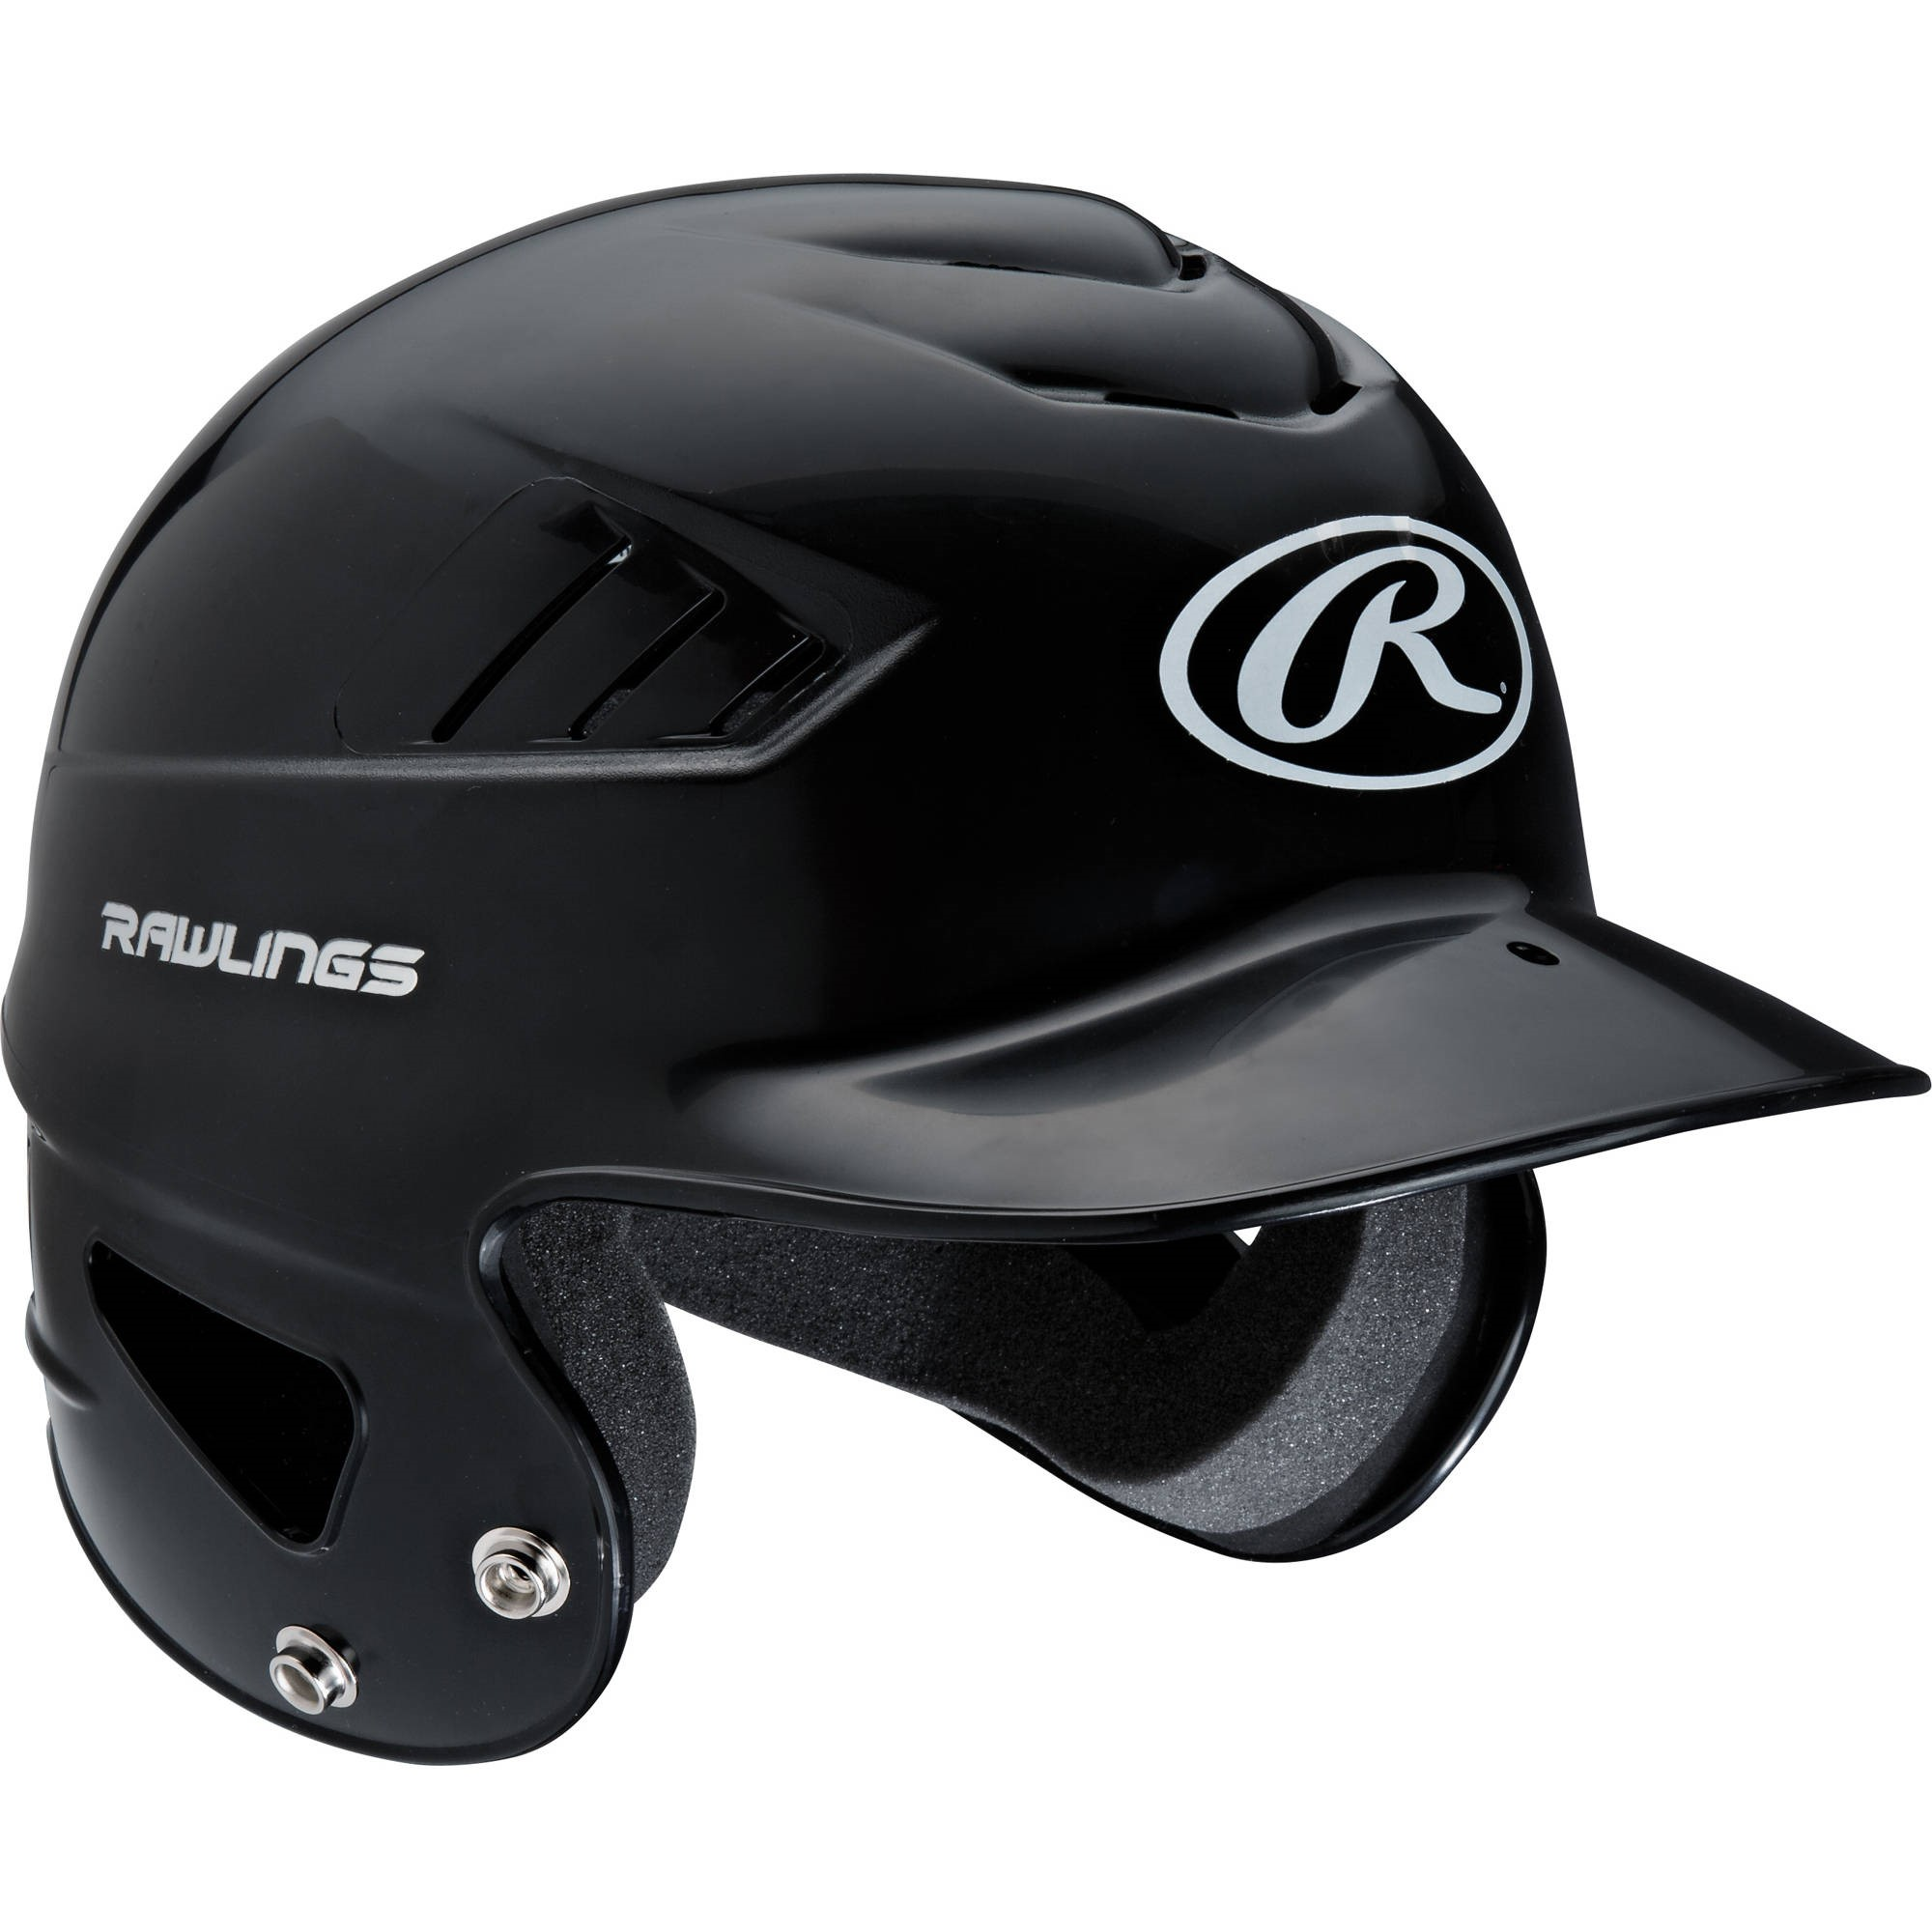 Rawlings Baseball Molded Baseball Helmet, Black RCFH-B